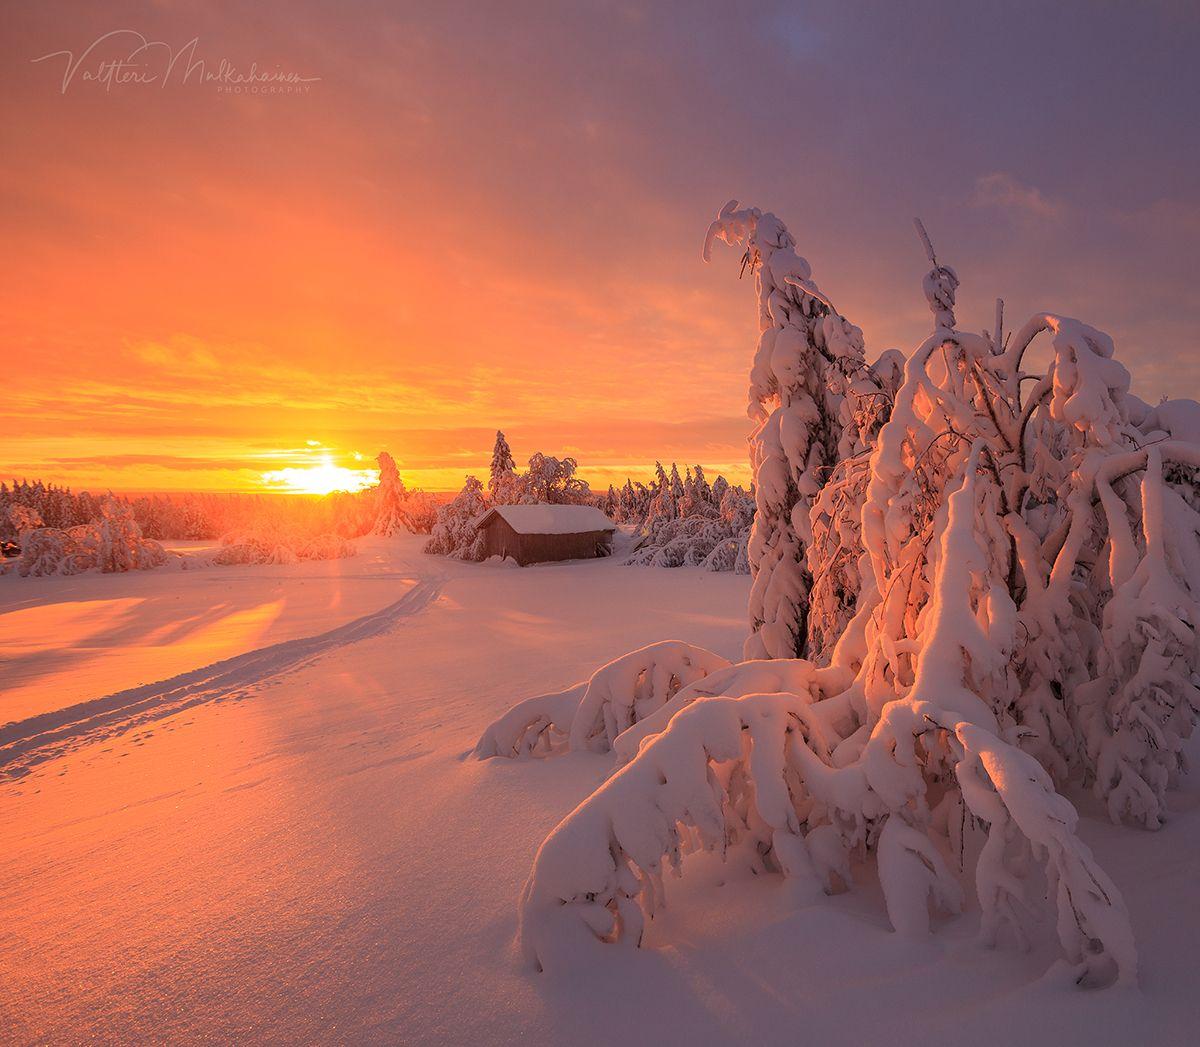 Зимнее солнце Лапландии.  Valtteri Mulkahainen